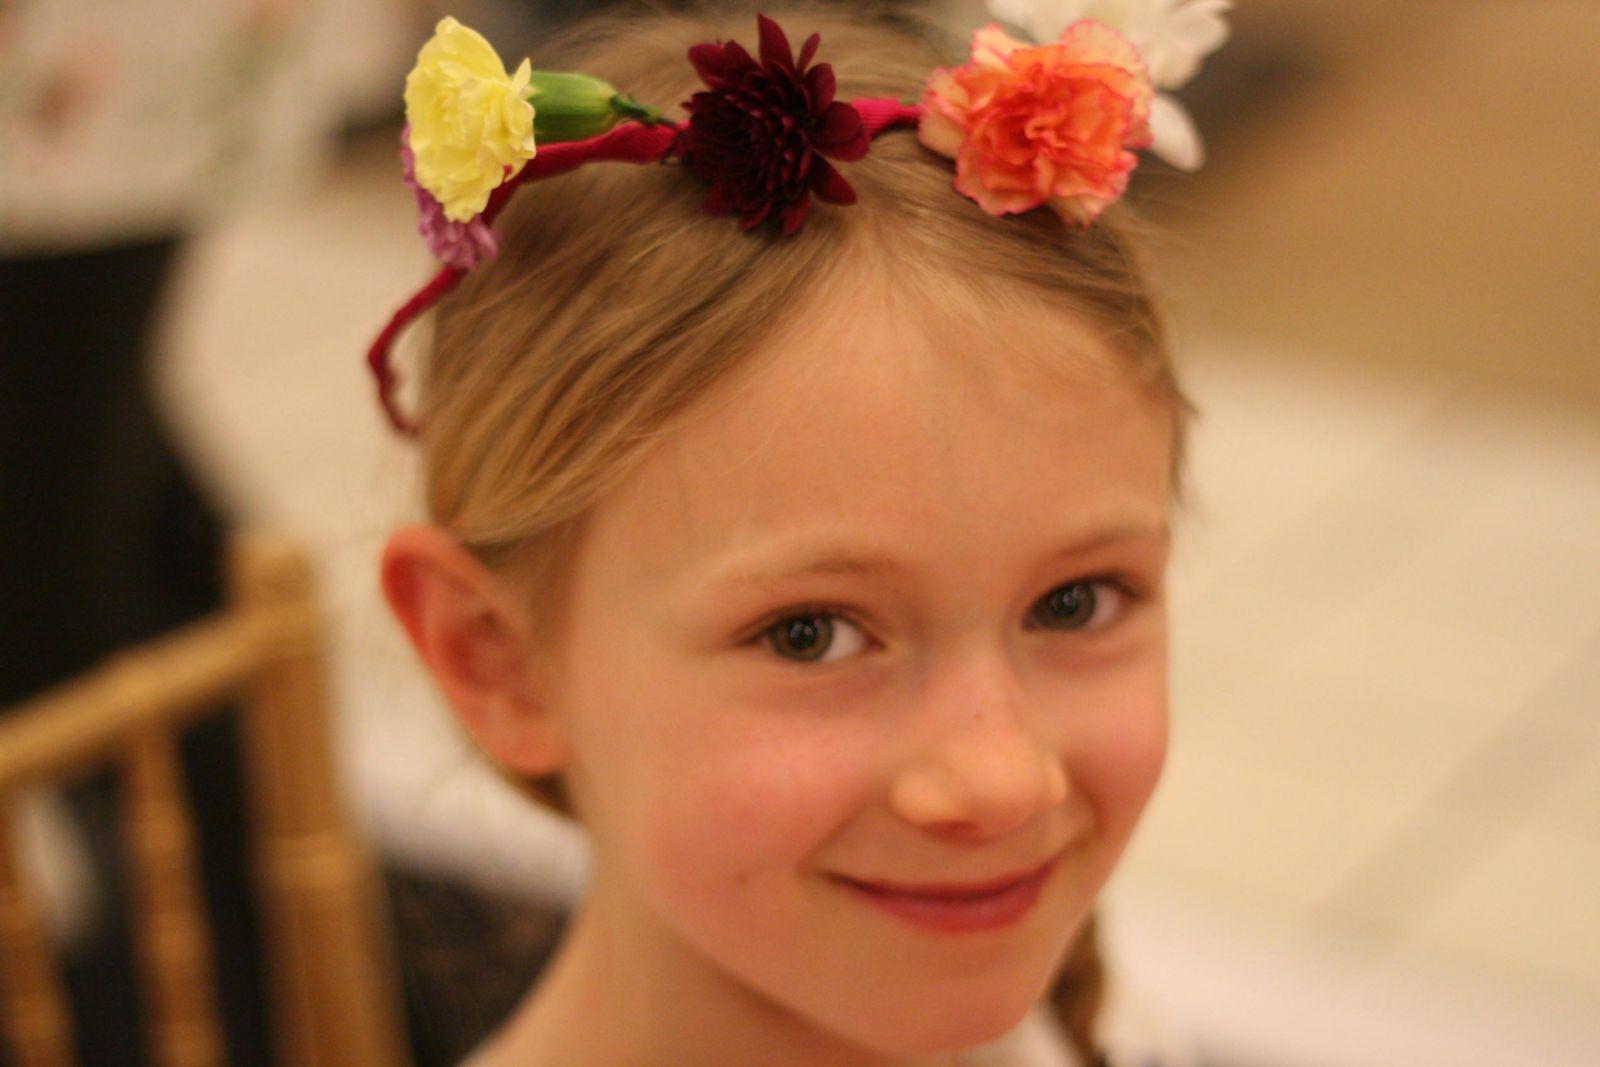 Sarah flower crown